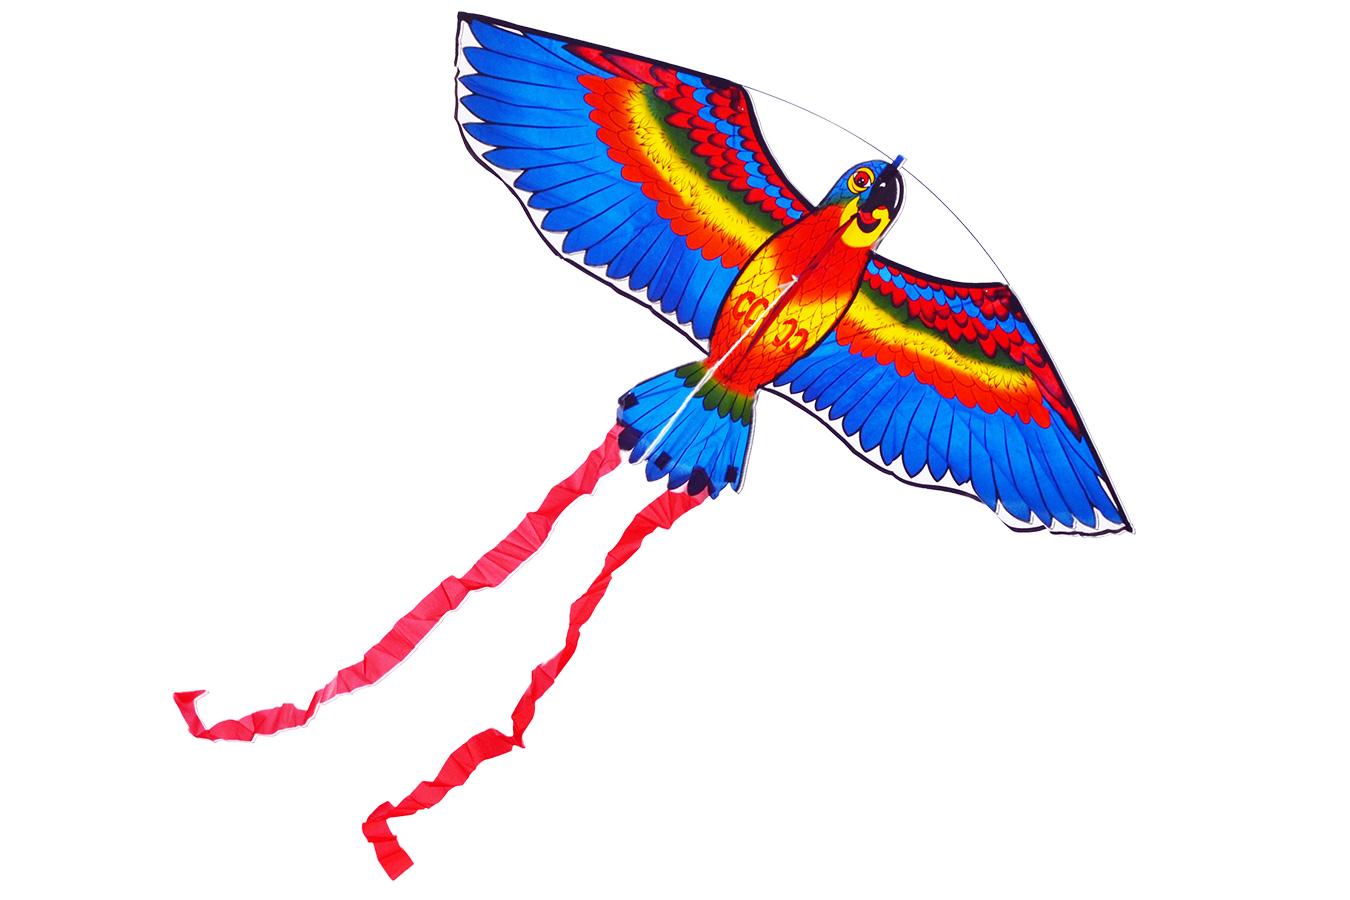 Попугай Розелла синий воздушный змей [ZVPRB]